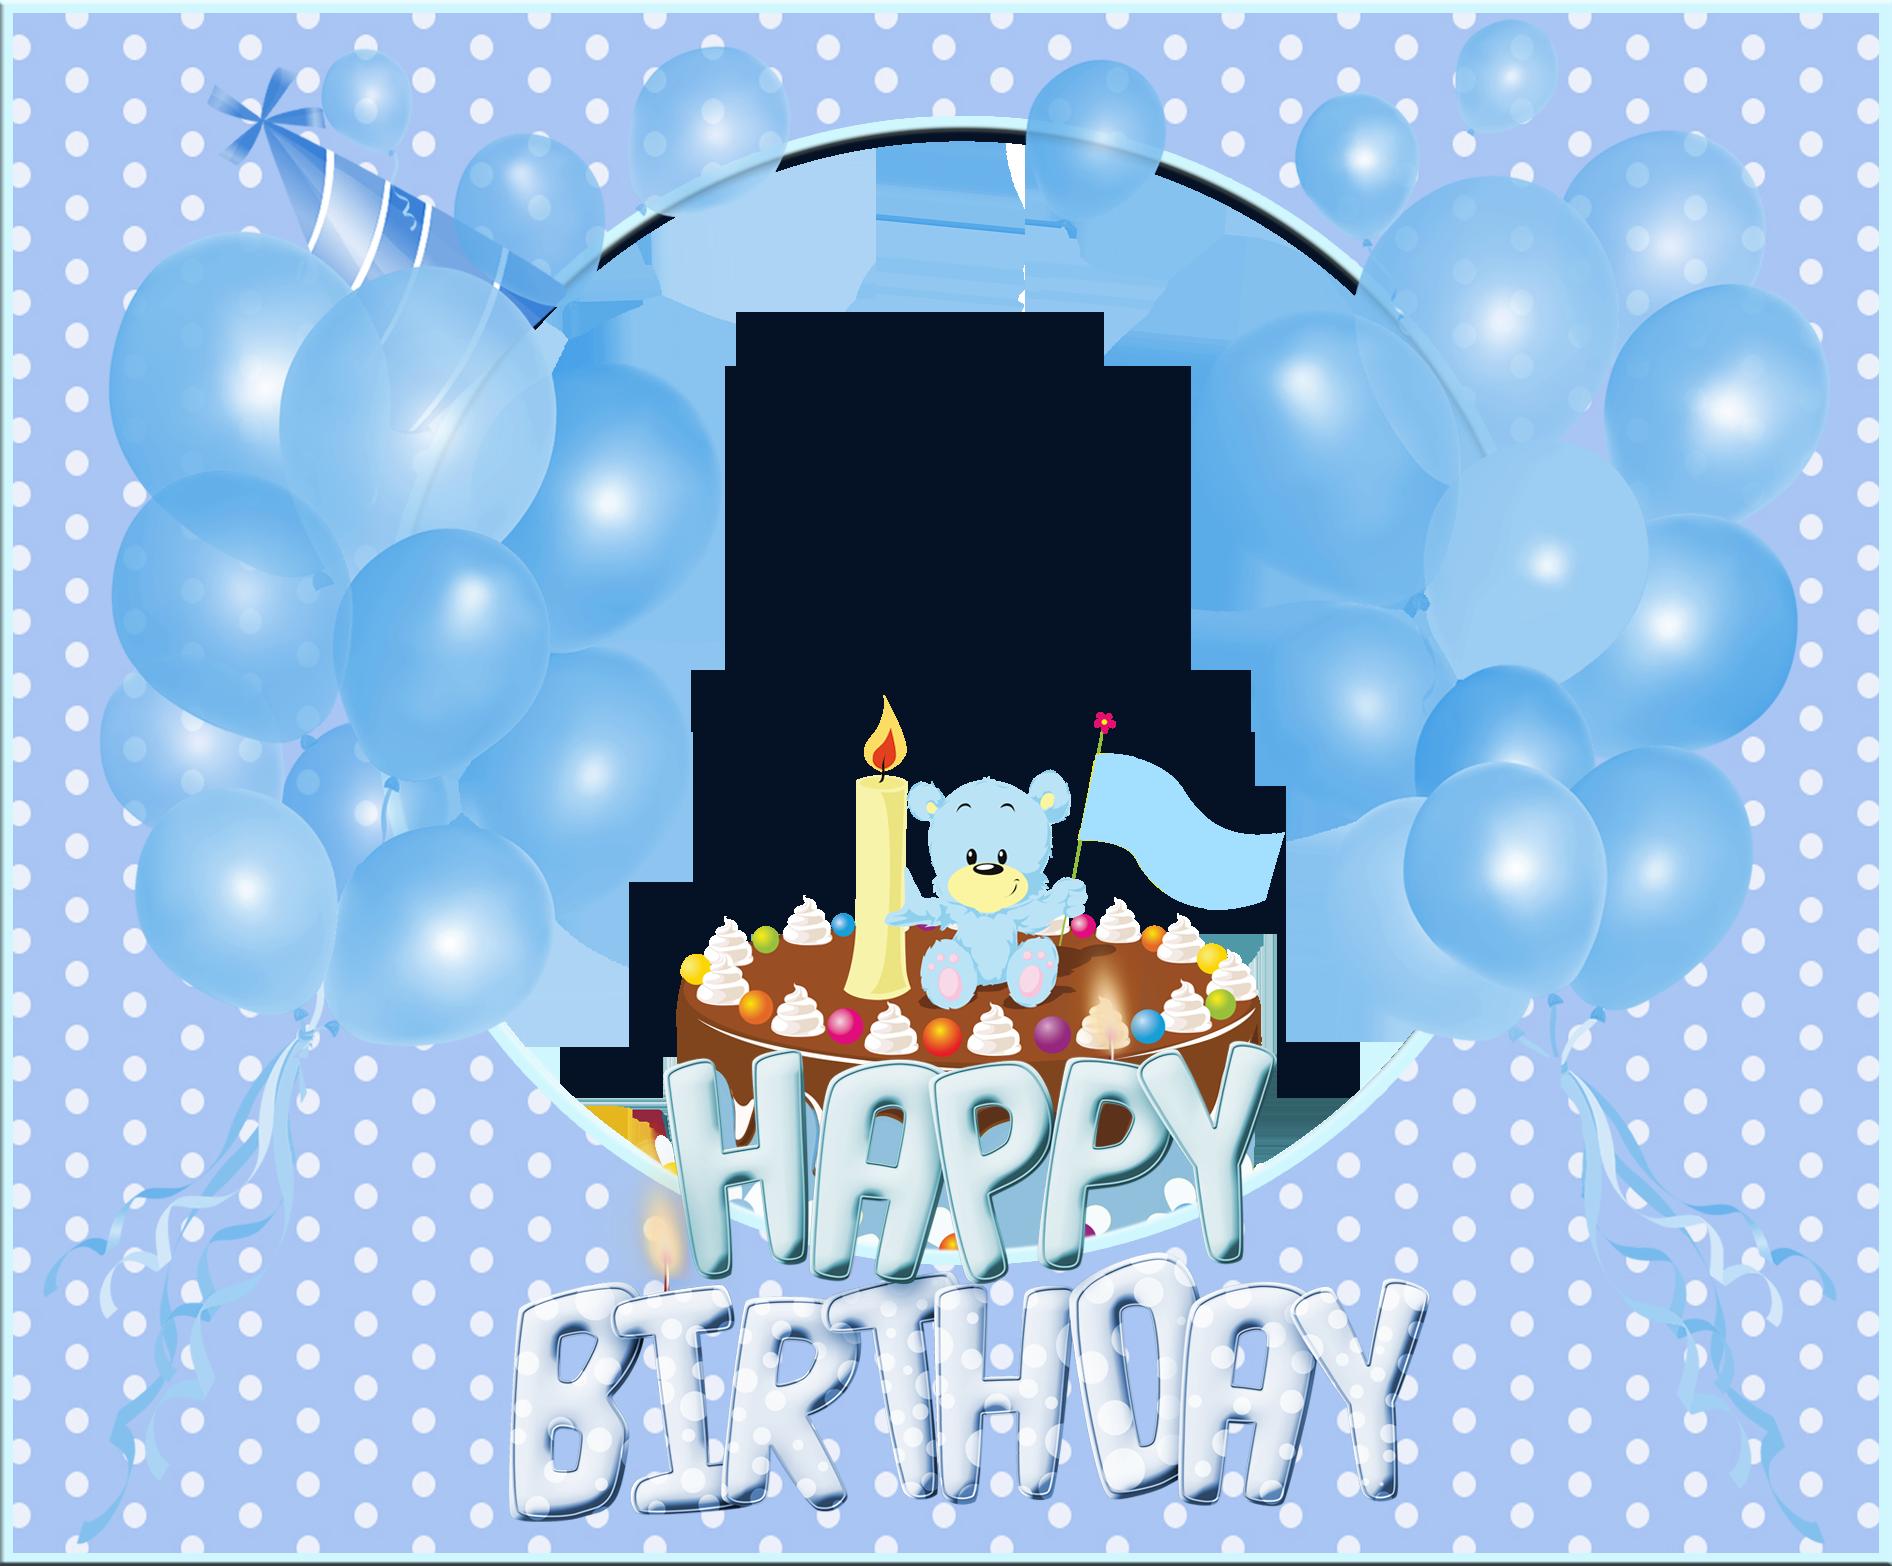 Happy Birthday Card Png ~ Happy birthday frame png cerca con google invitations pinterest and birthdays